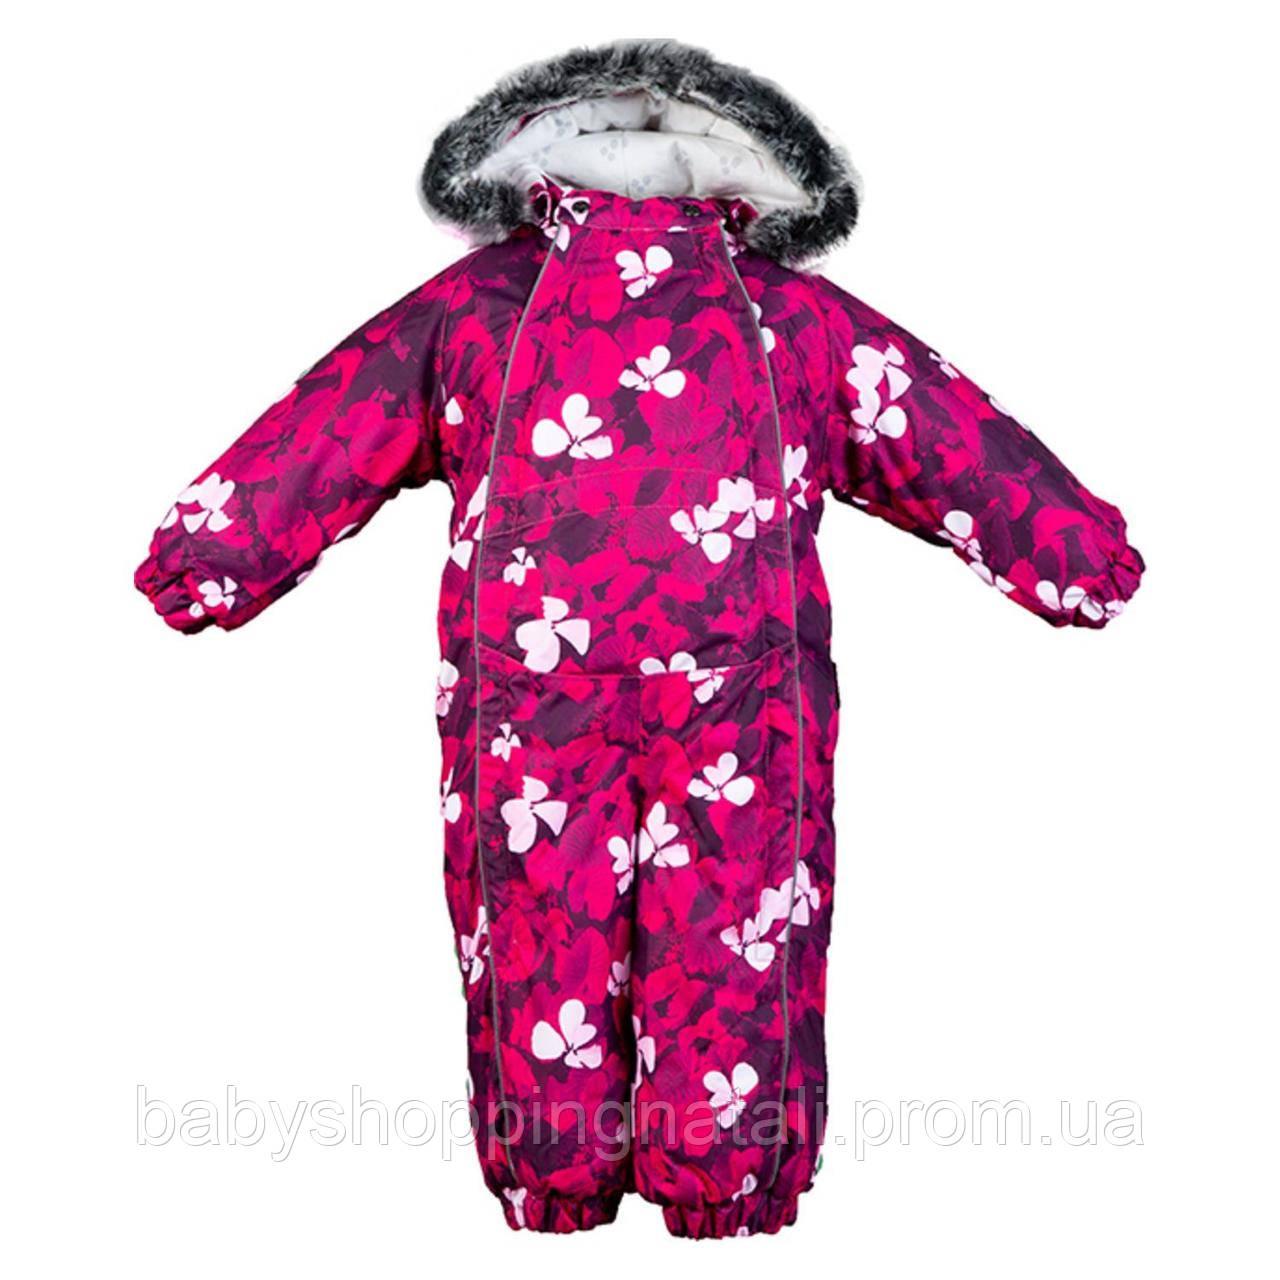 Детский зимний термокомбинезон REGGIE 1 HUPPA, REGGIE 1 36020130-81663, 12 мес (80 см), 12 мес (80 см)